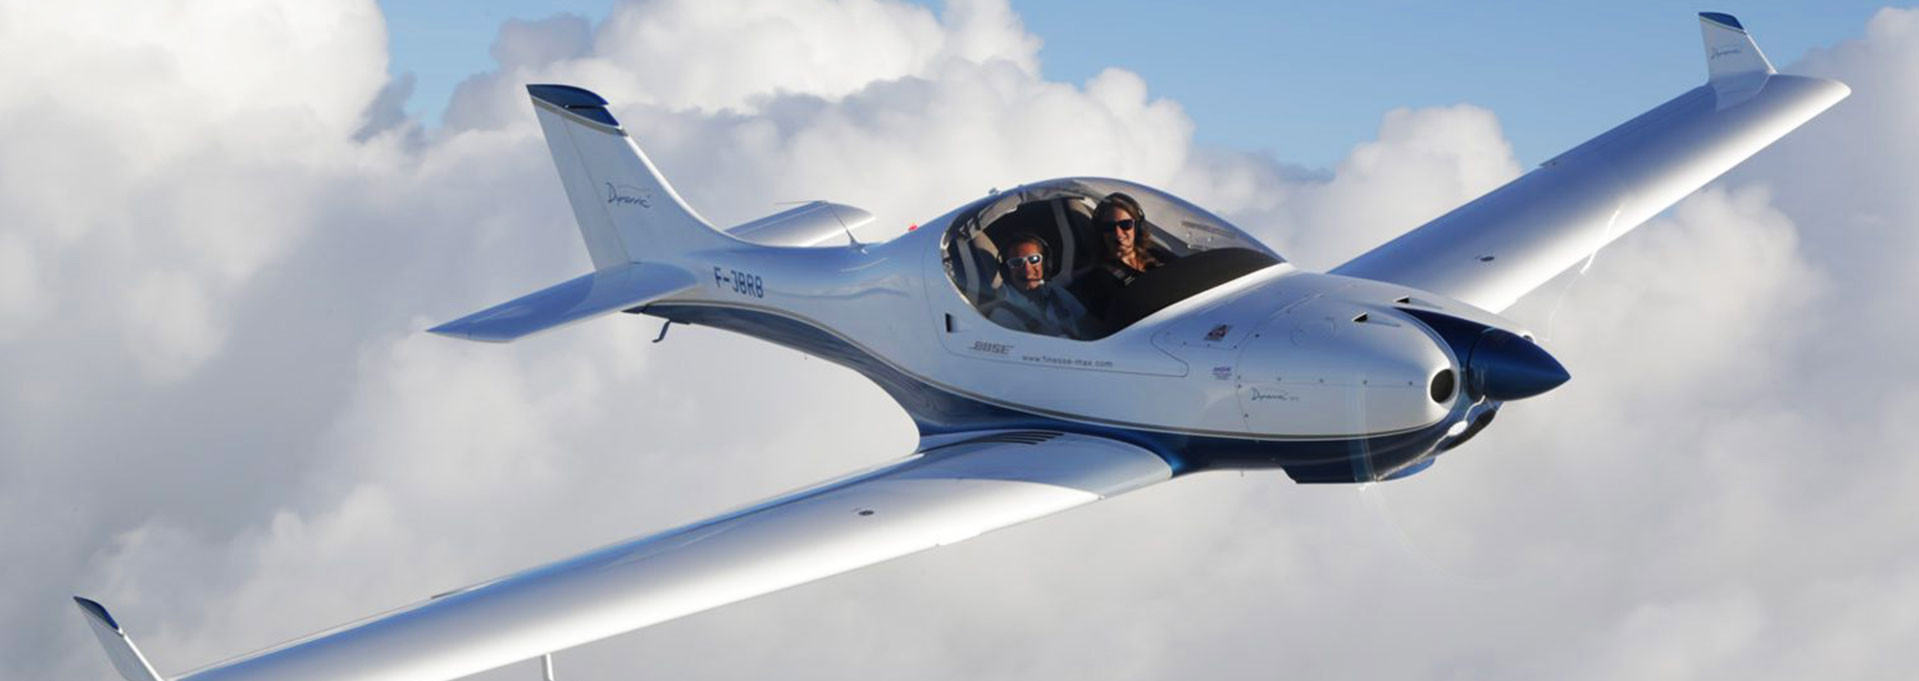 WT9-Dynamic-ecole-de-pilotage-firstfligh